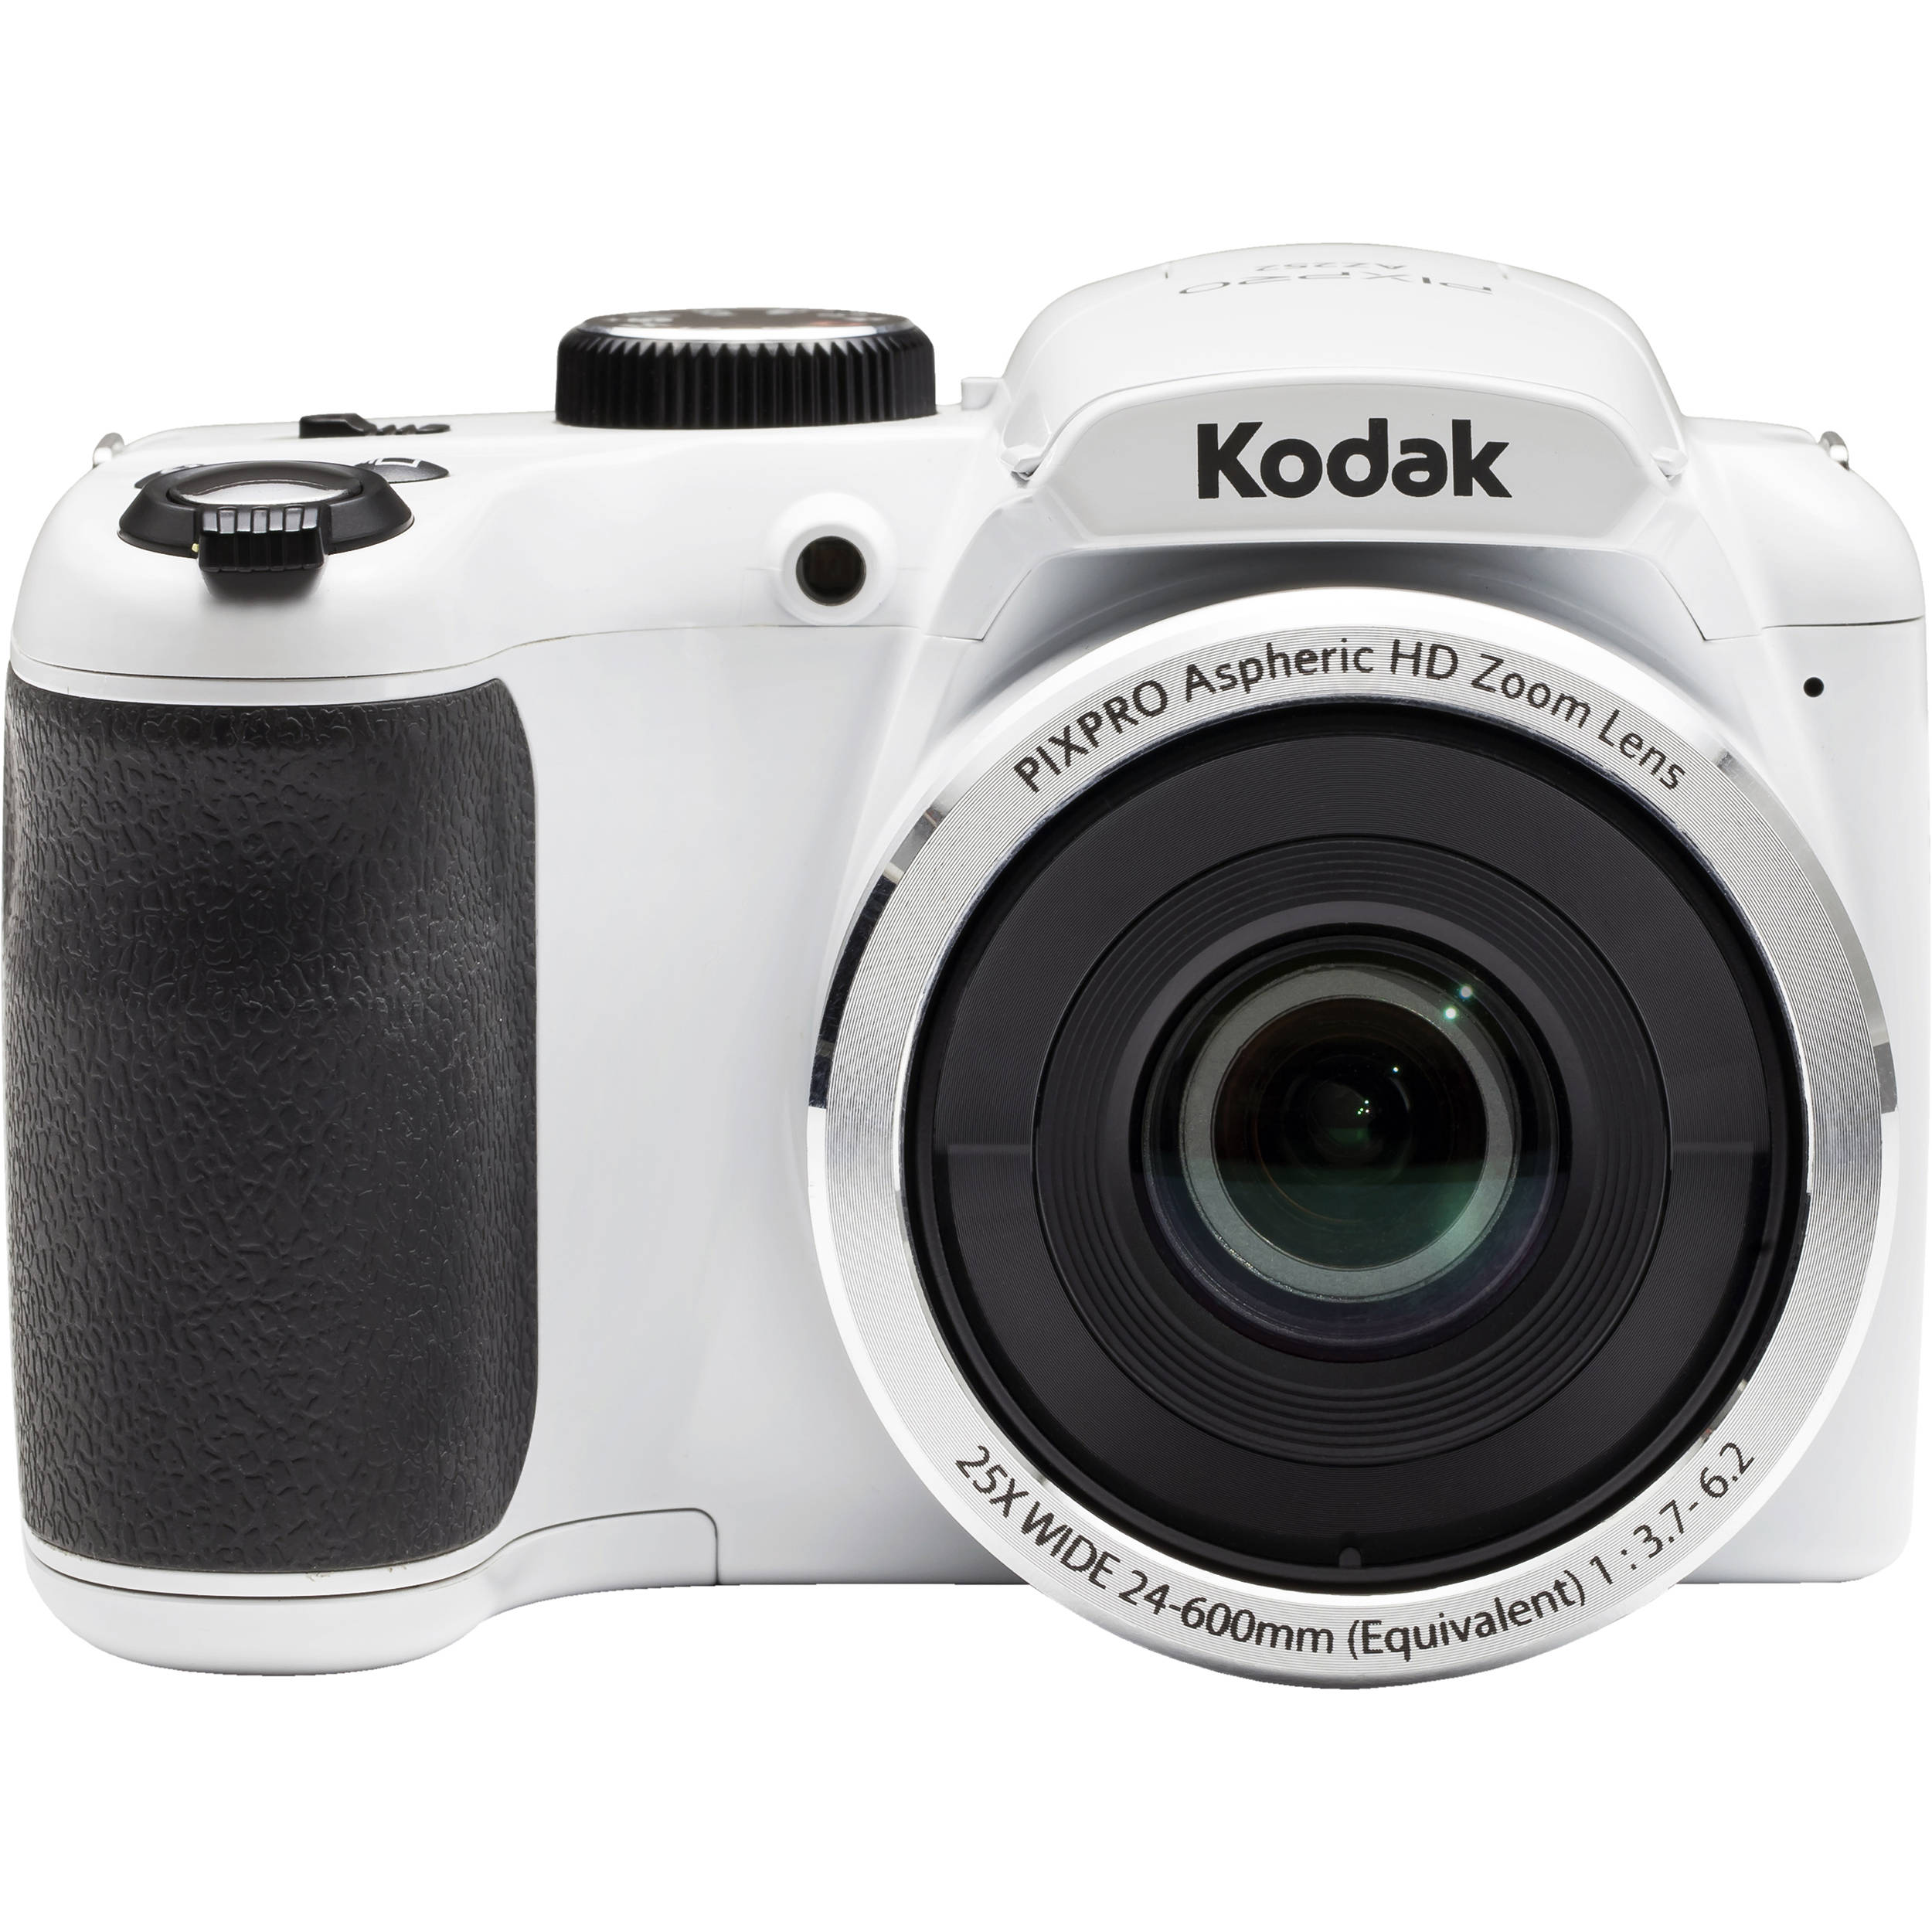 kodak pixpro az252 digital camera white az252wh b h photo rh bhphotovideo com Kodak 3X Optical Zoom Camera Kodak Camera Bike